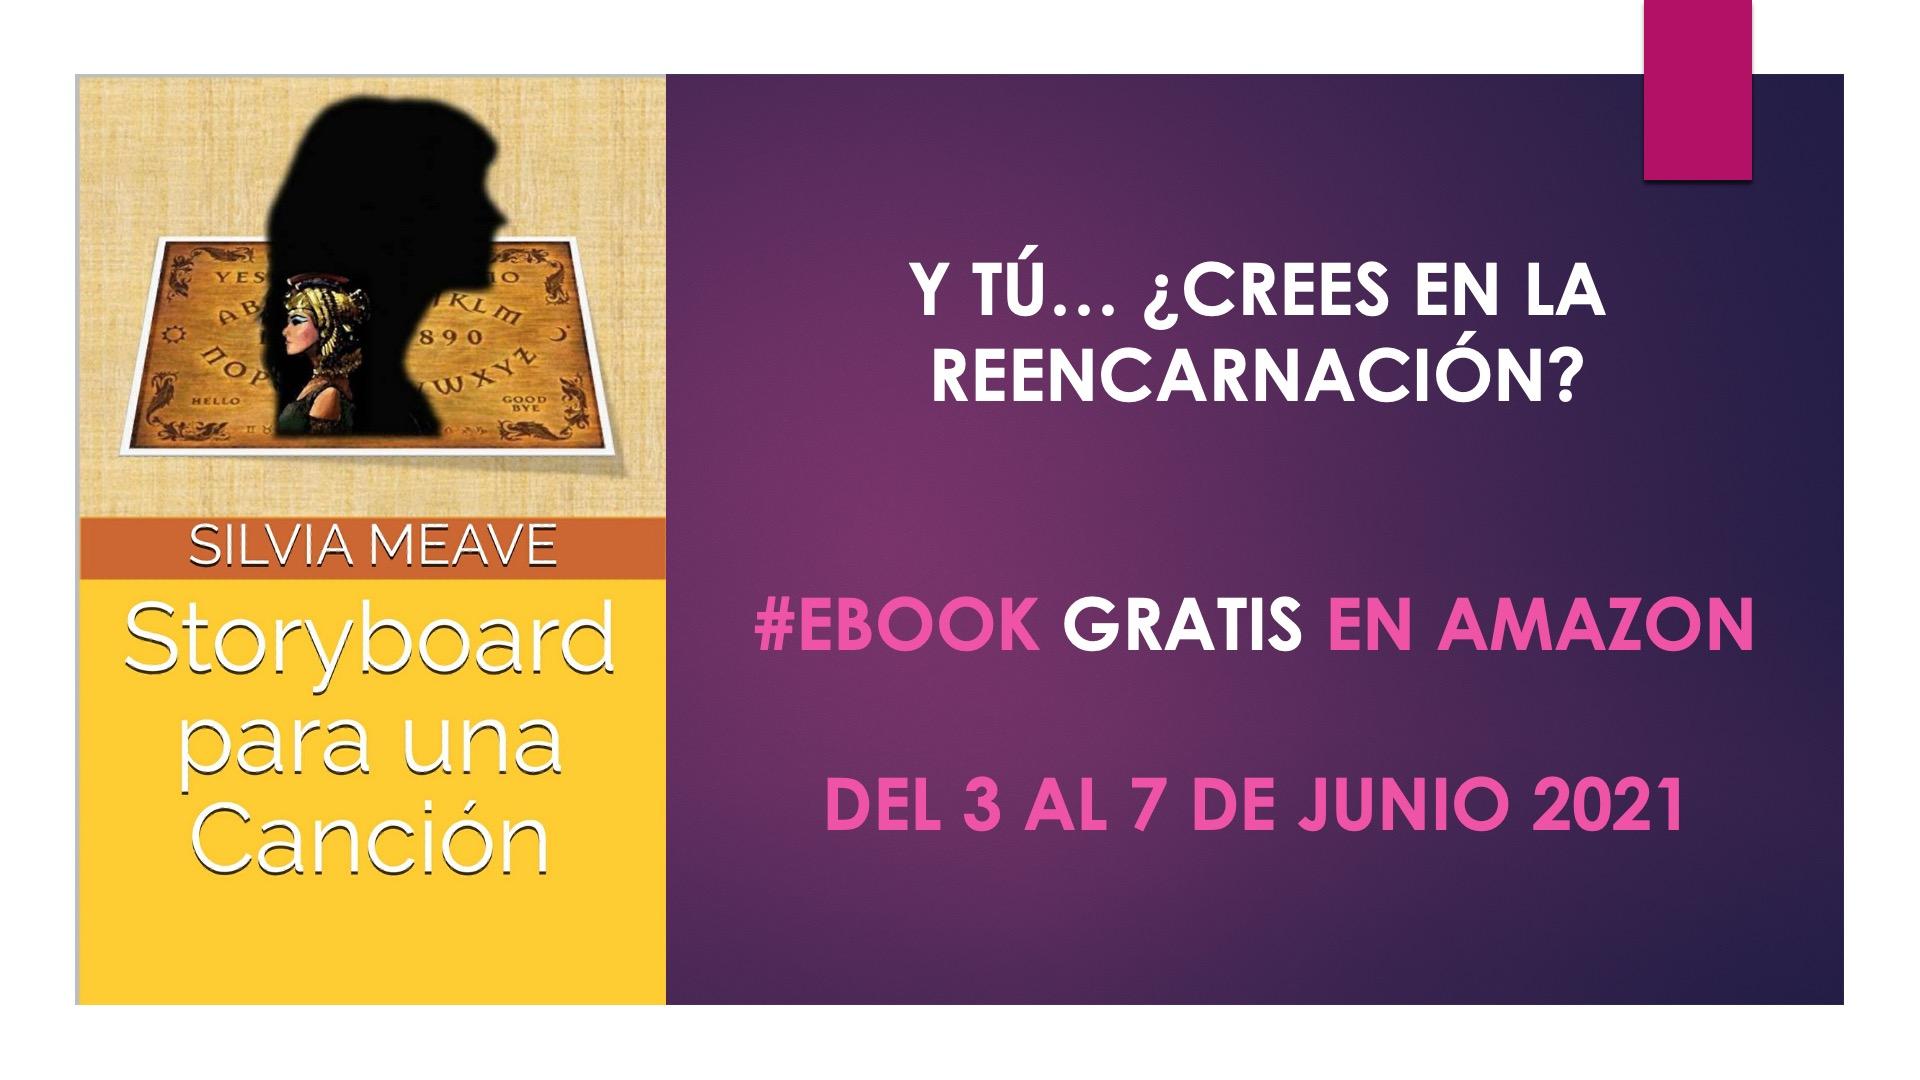 LibrosGratis AmazonBooks AmazonPrime NovelaRomantica